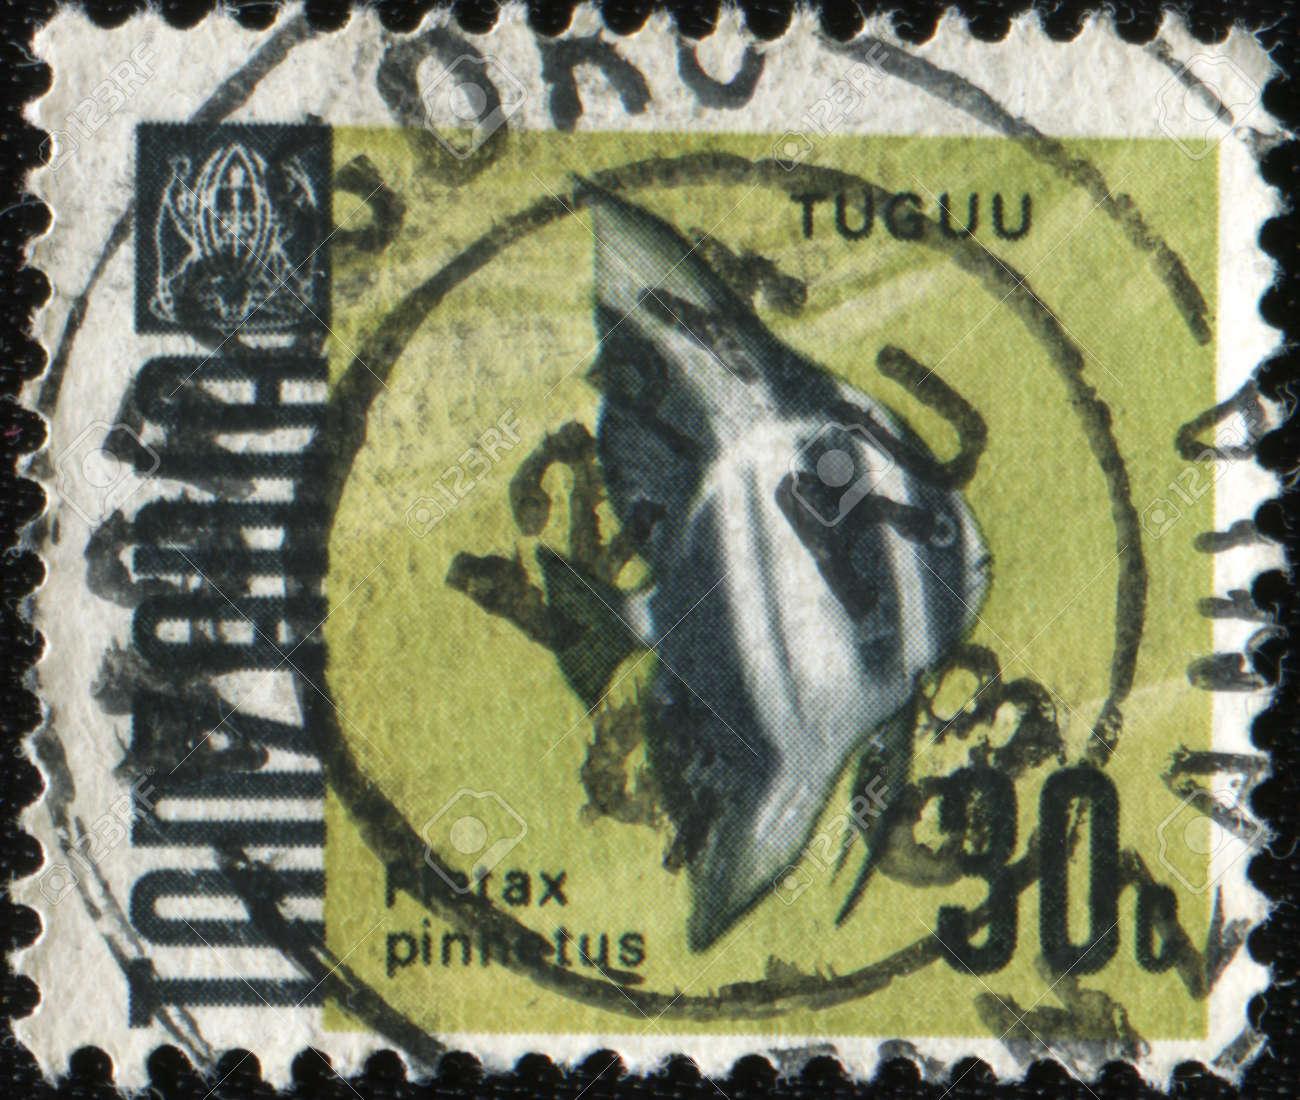 TANZWNIA - CIRCA 1973: A stamp printed in Tanzania shows West African spadefish - Ephippidae, circa 1973 Stock Photo - 8964204